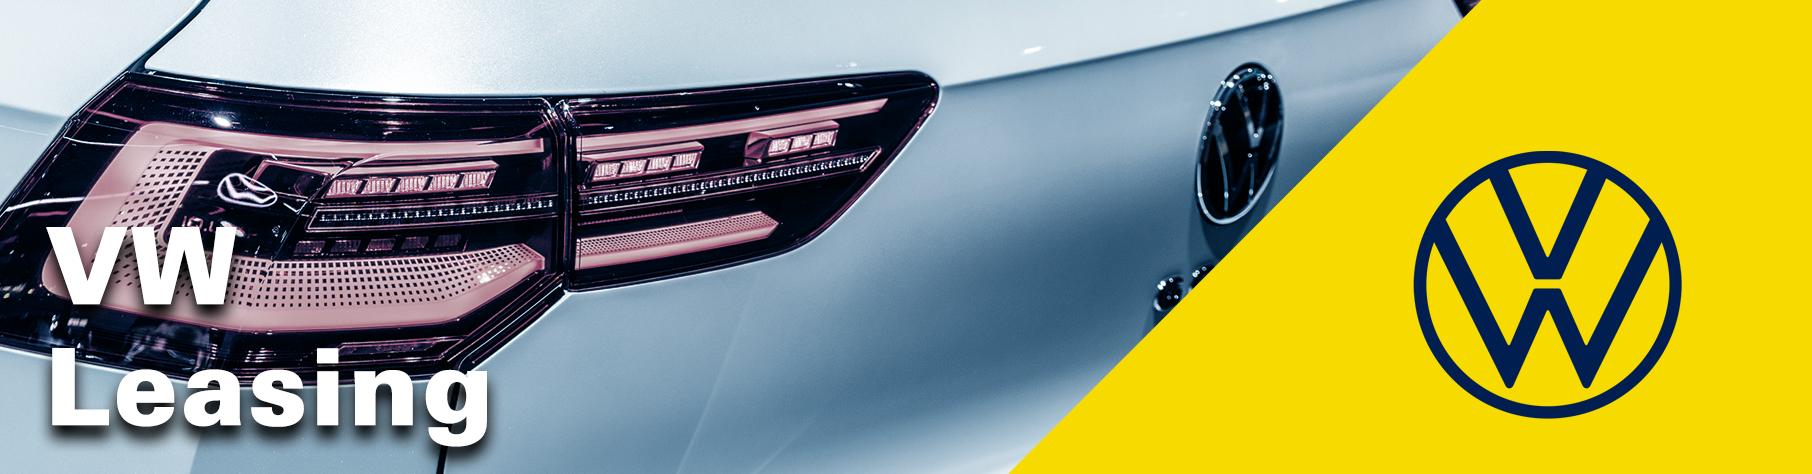 VW Polo-Leasing für Ihr Business - Unsere VW Polo-Leasing-Bestseller